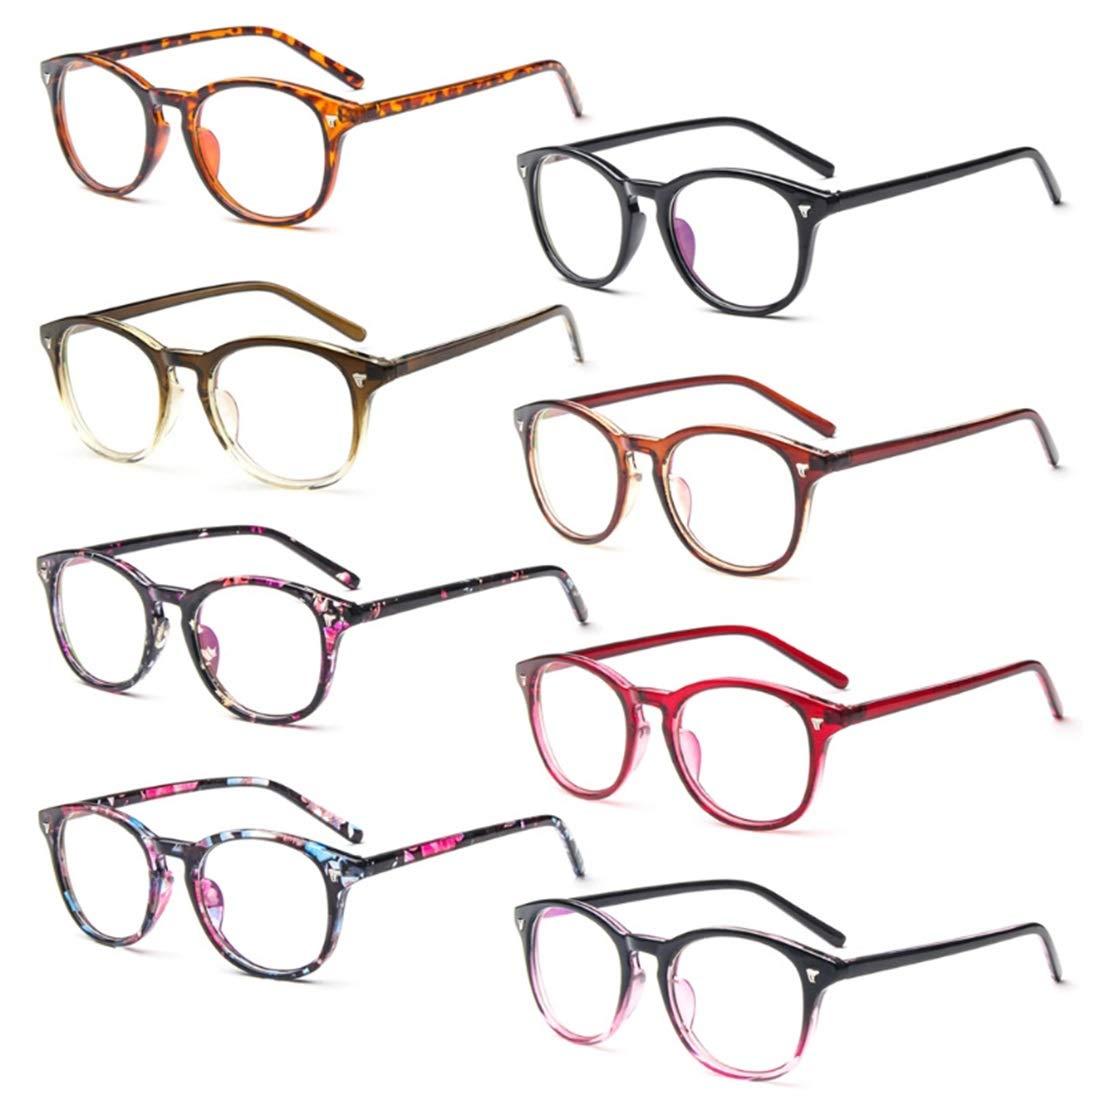 CHICLI Men Women Unisex Vintage Clear Lens Eyeglasses Retro Glasses Optical Classic Frames Glasses TEA